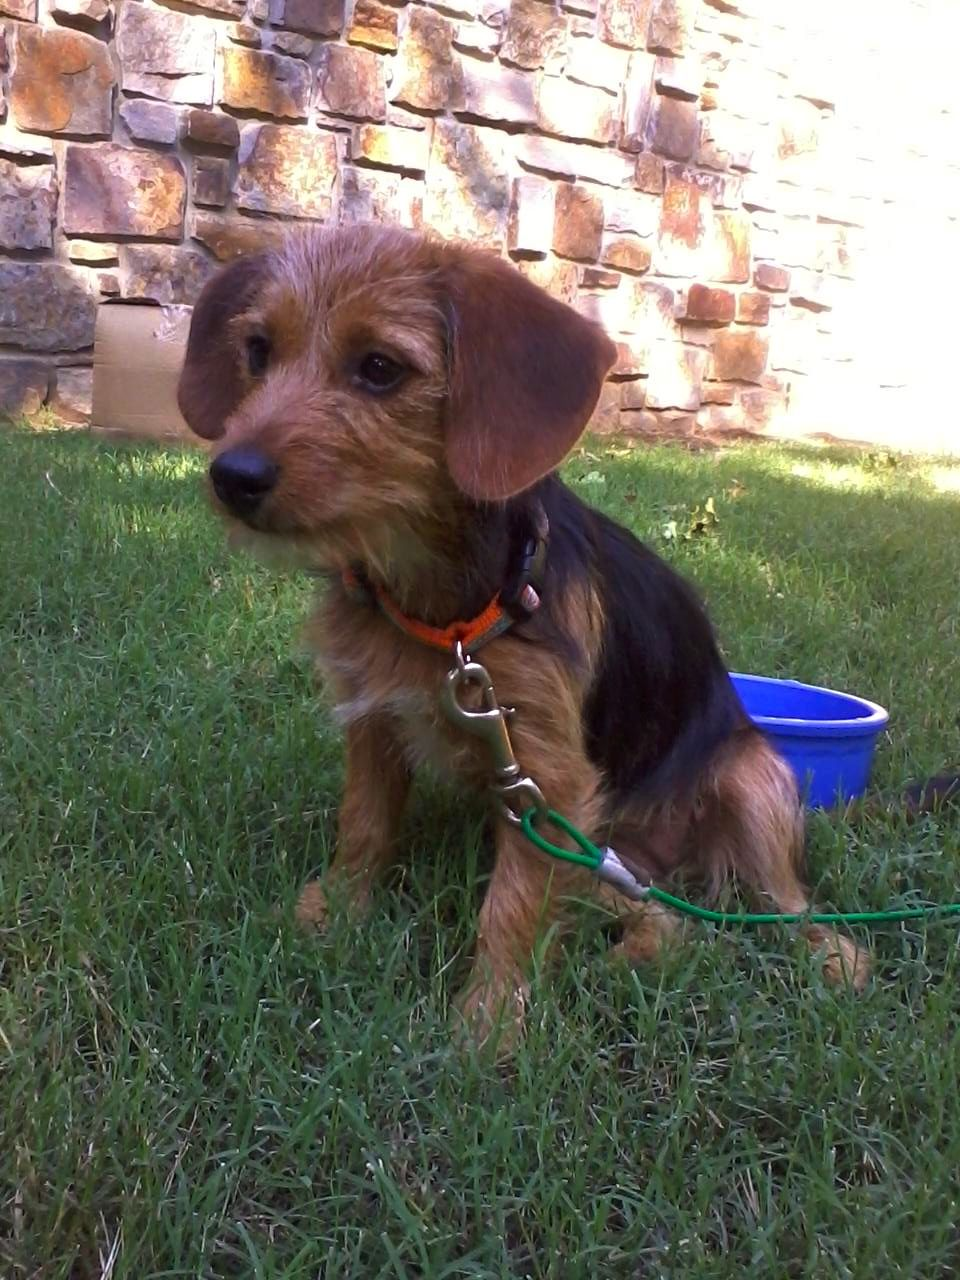 My Dorkie puppy! Dachshund + Yorkie = Dorkie